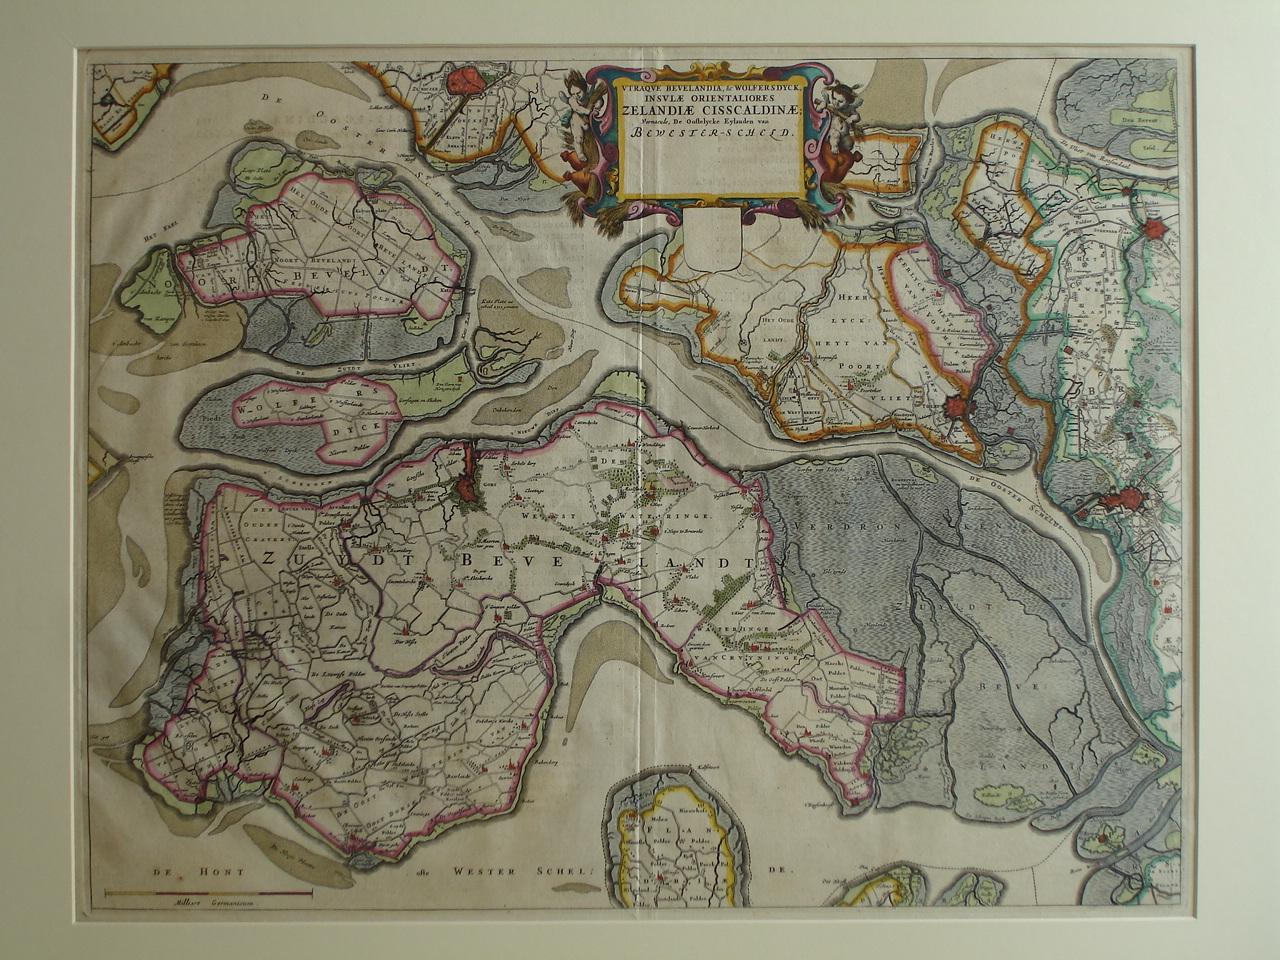 ZEELAND.. - Utraque Bevelandia, & Wolfersdyck, Insulae orientaliores Zelandiae Cisscaldinae; vermacule, De Oostelycke Eylanden van Bewester-Scheld.